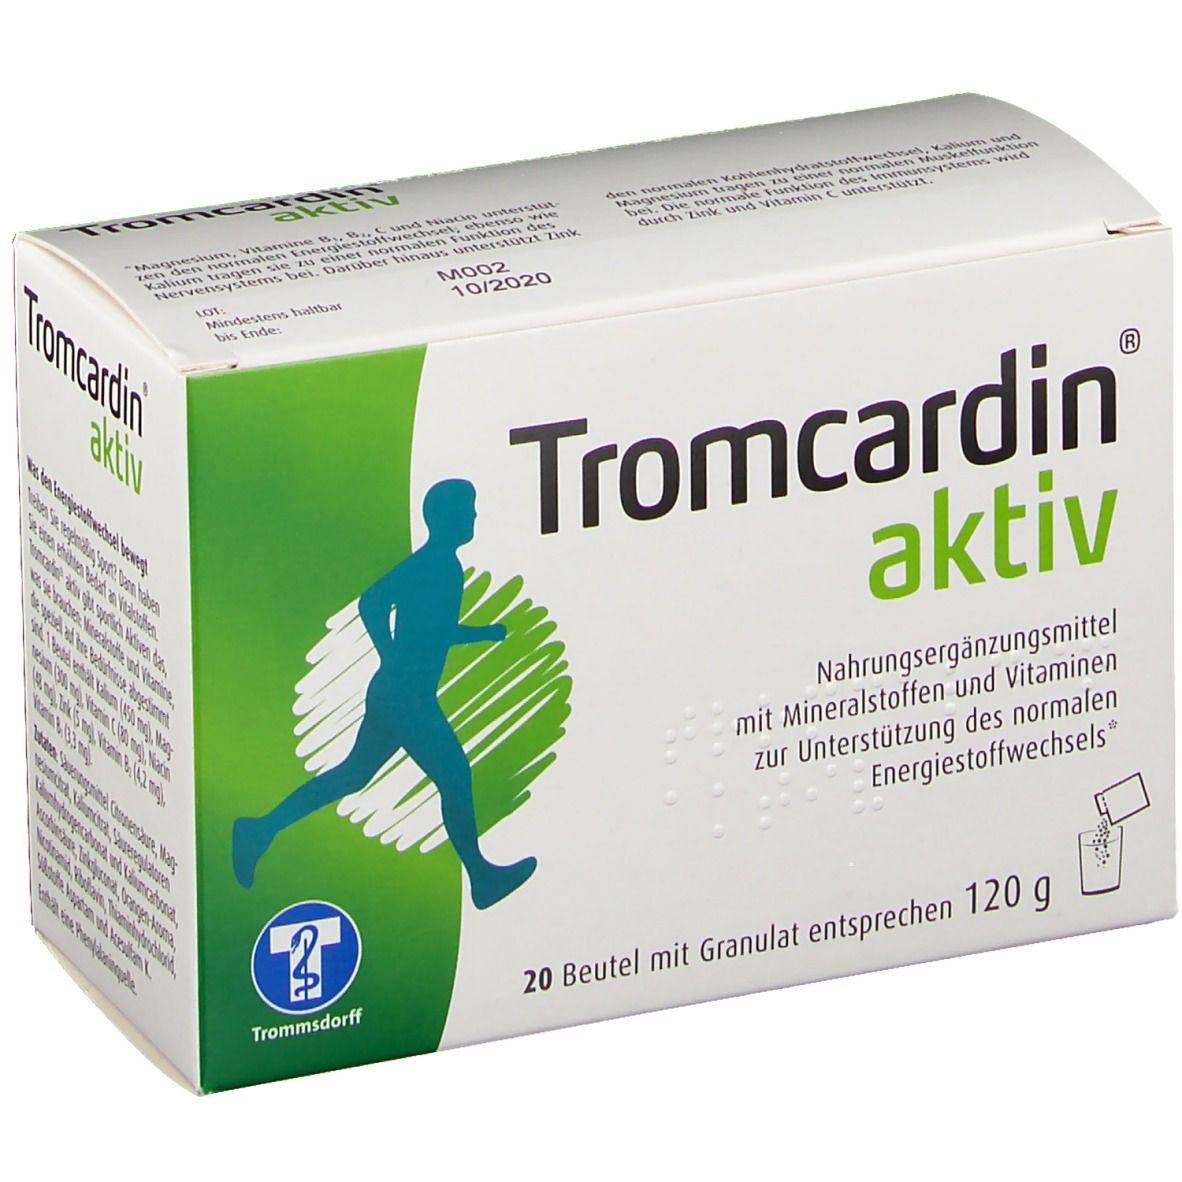 Tromcardin® aktiv